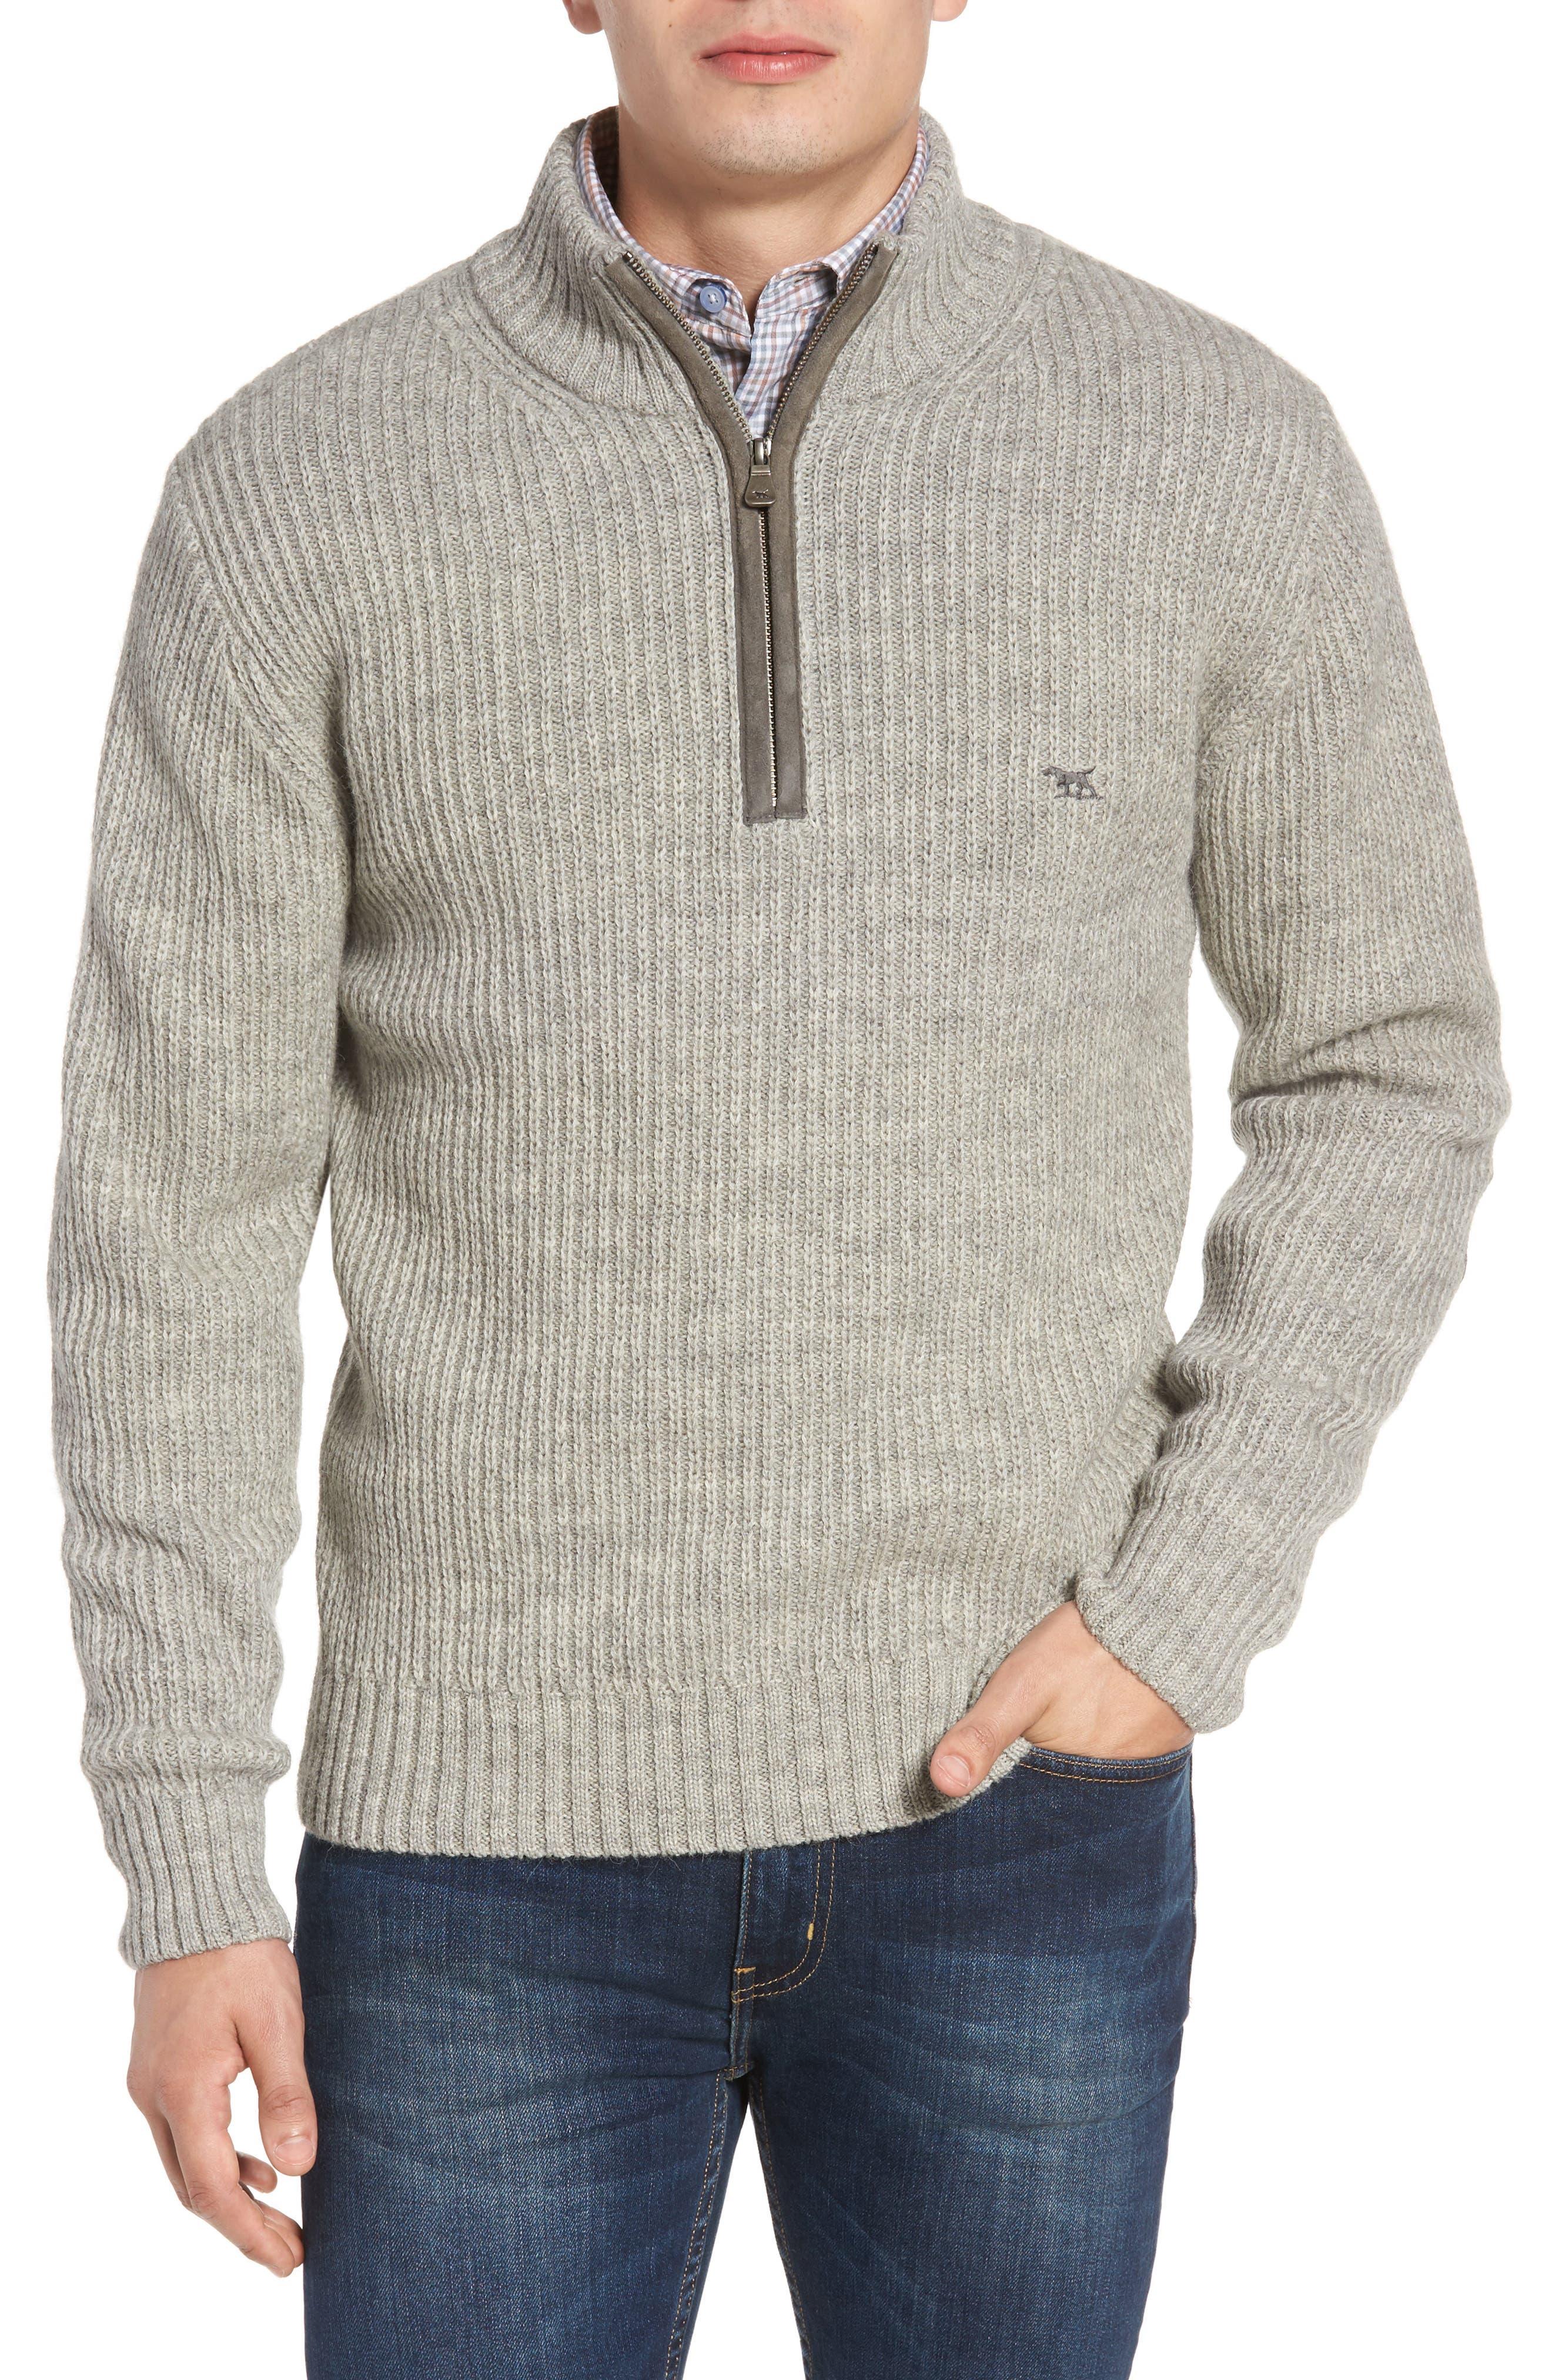 'Huka Lodge' Merino Wool Blend Quarter Zip Sweater,                         Main,                         color, 268